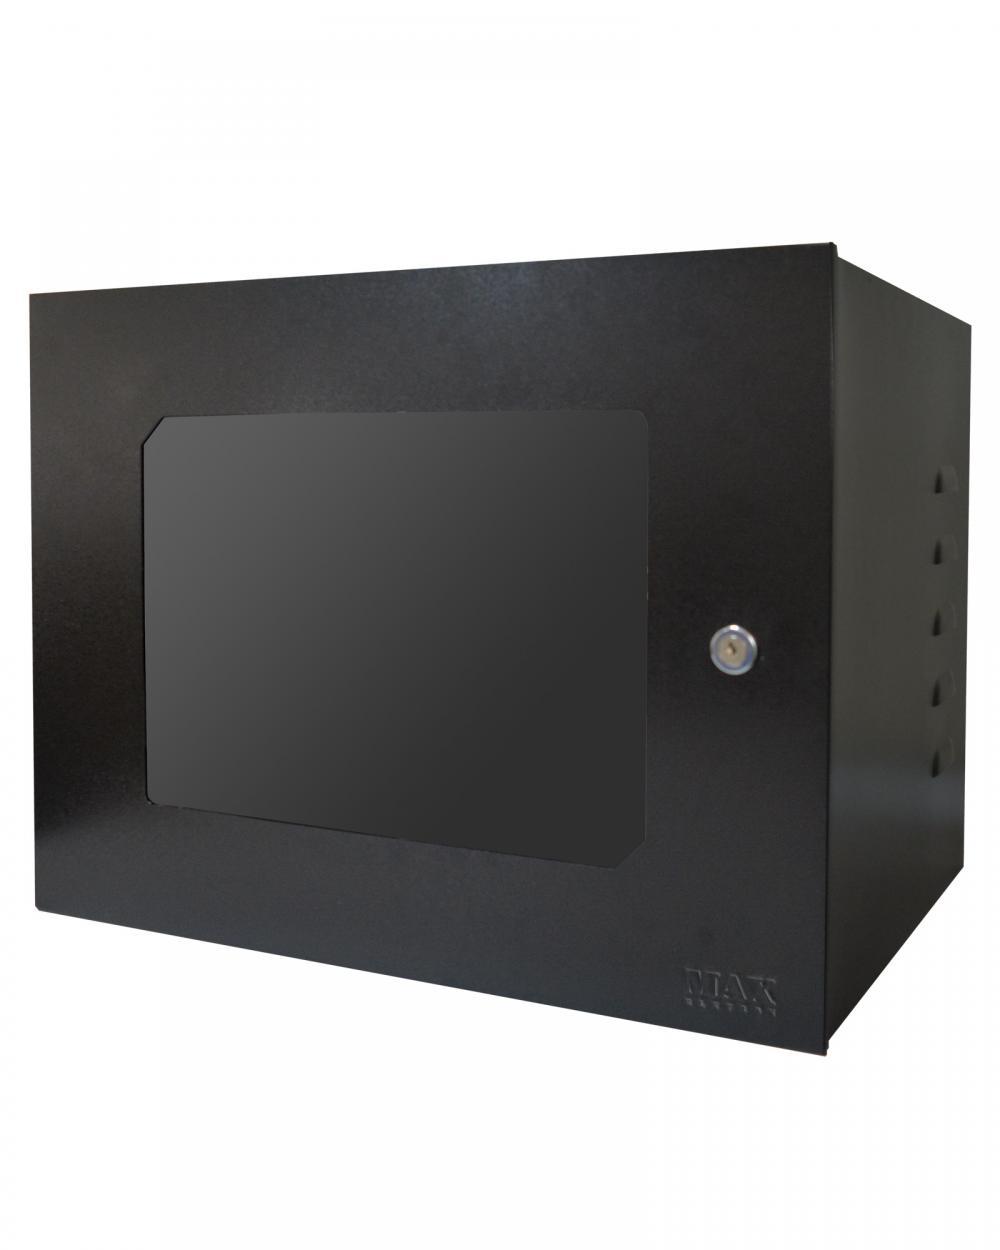 Mini Rack 8U x 350mm Economic Porta c/ Visor Acrílico Preto